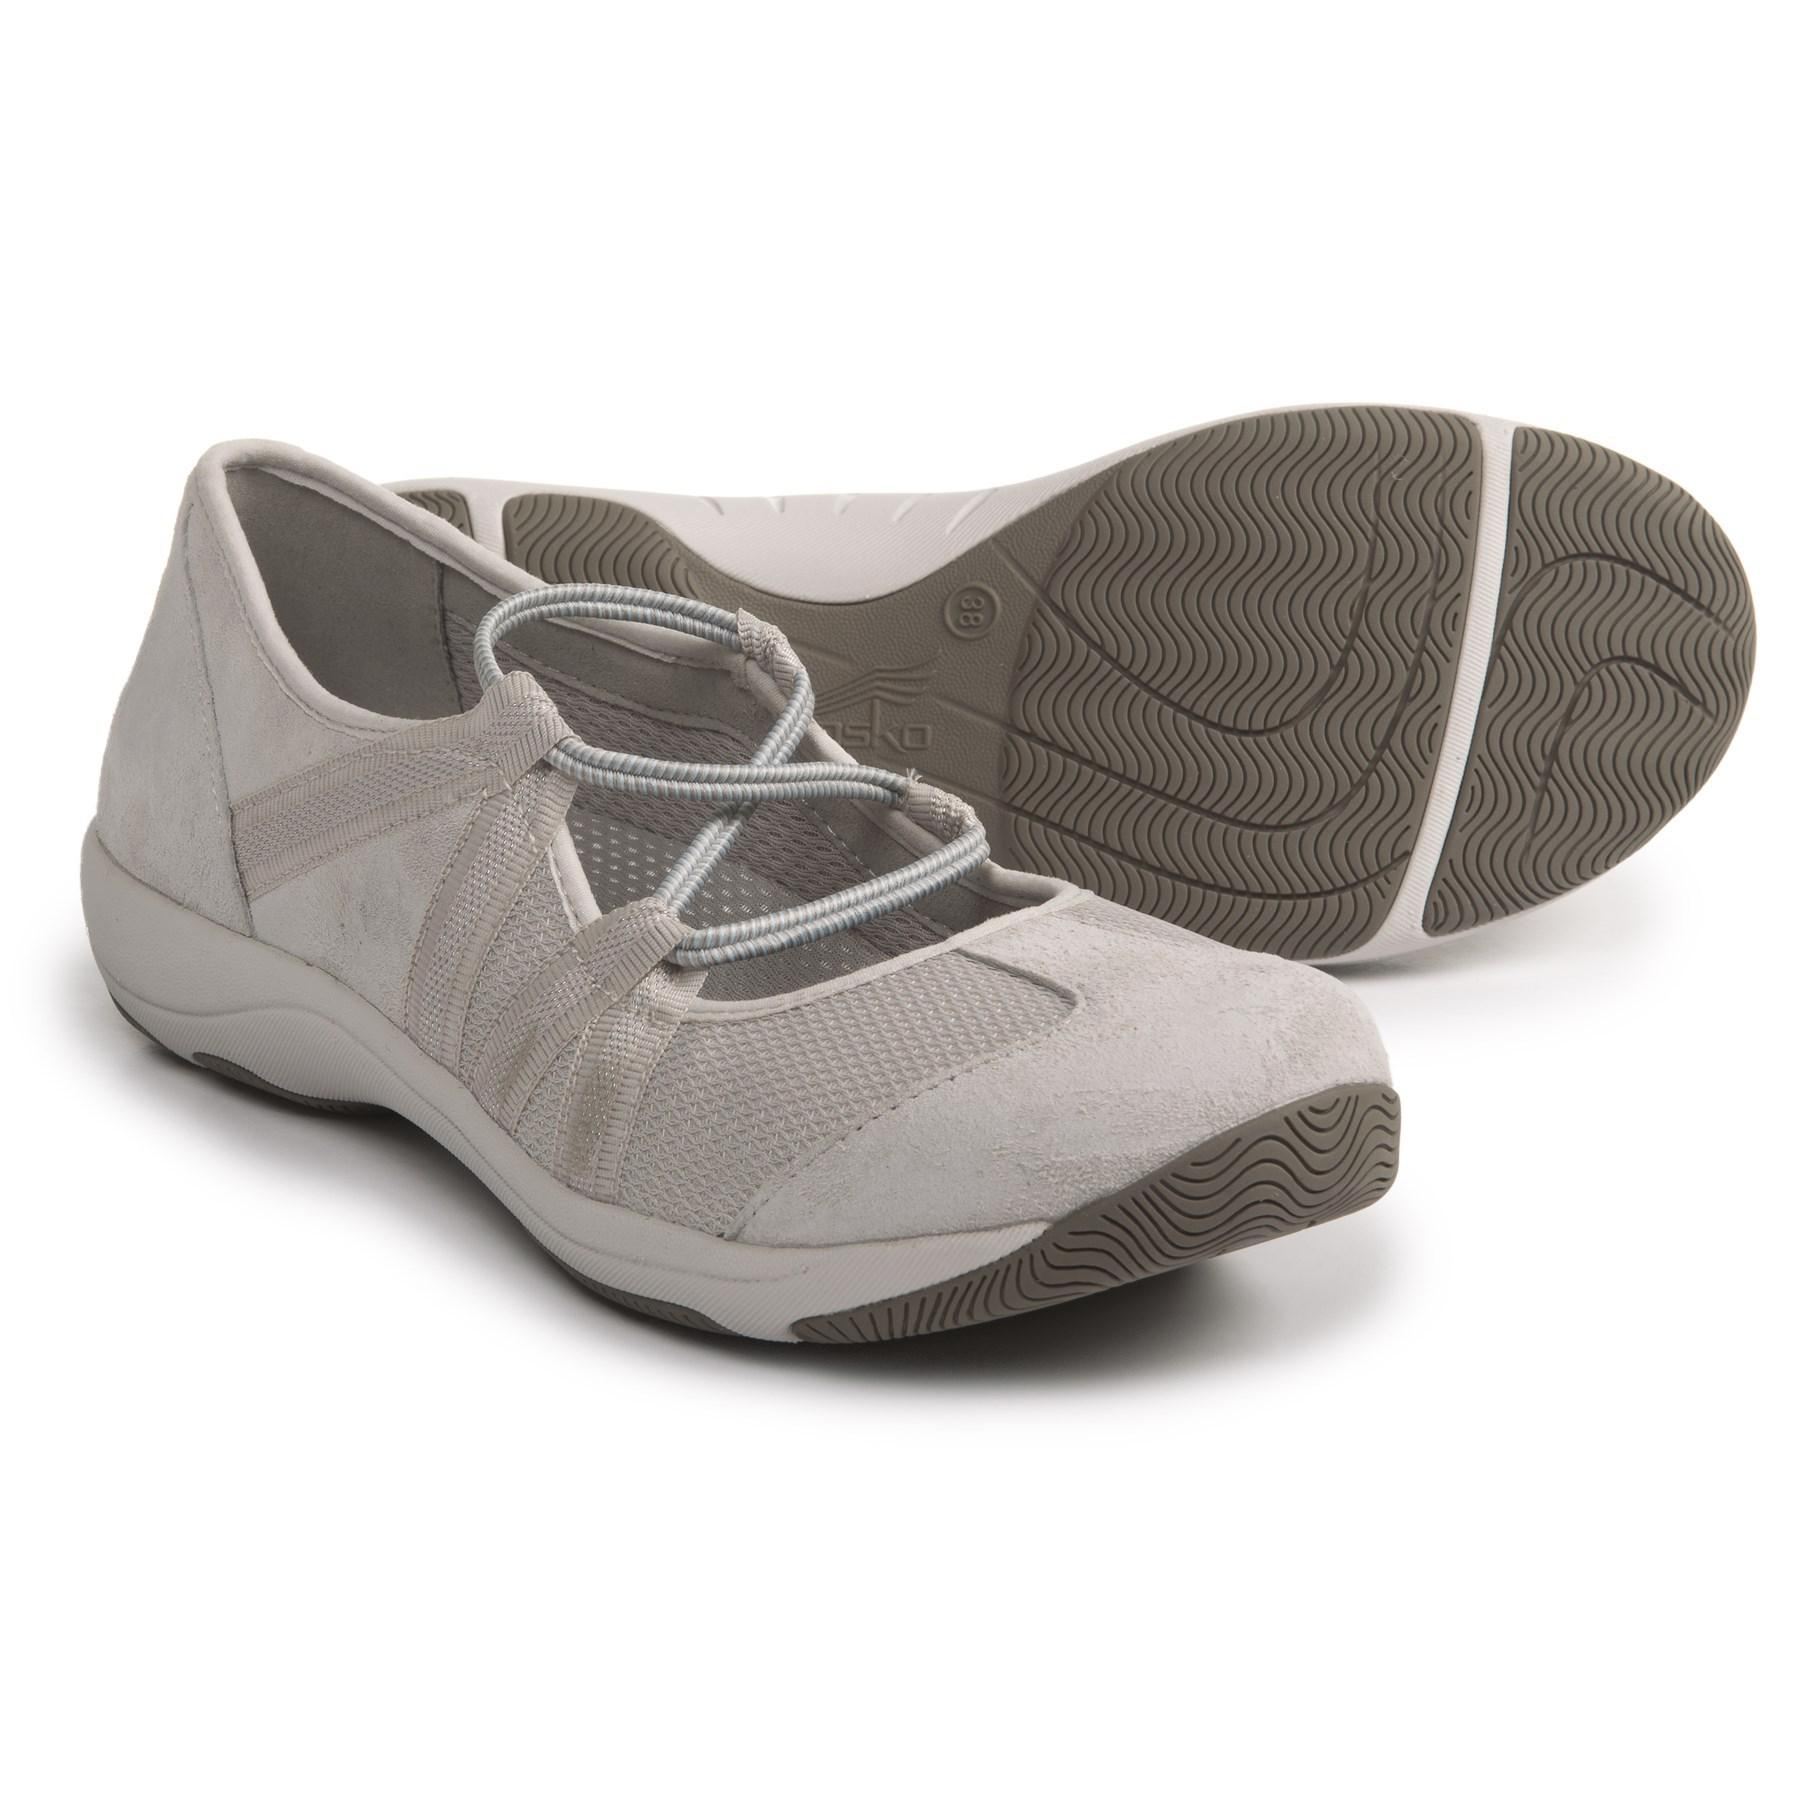 da1b092bf1b8 Lyst - Dansko Honey Athletic Mary Jane Shoes in Gray